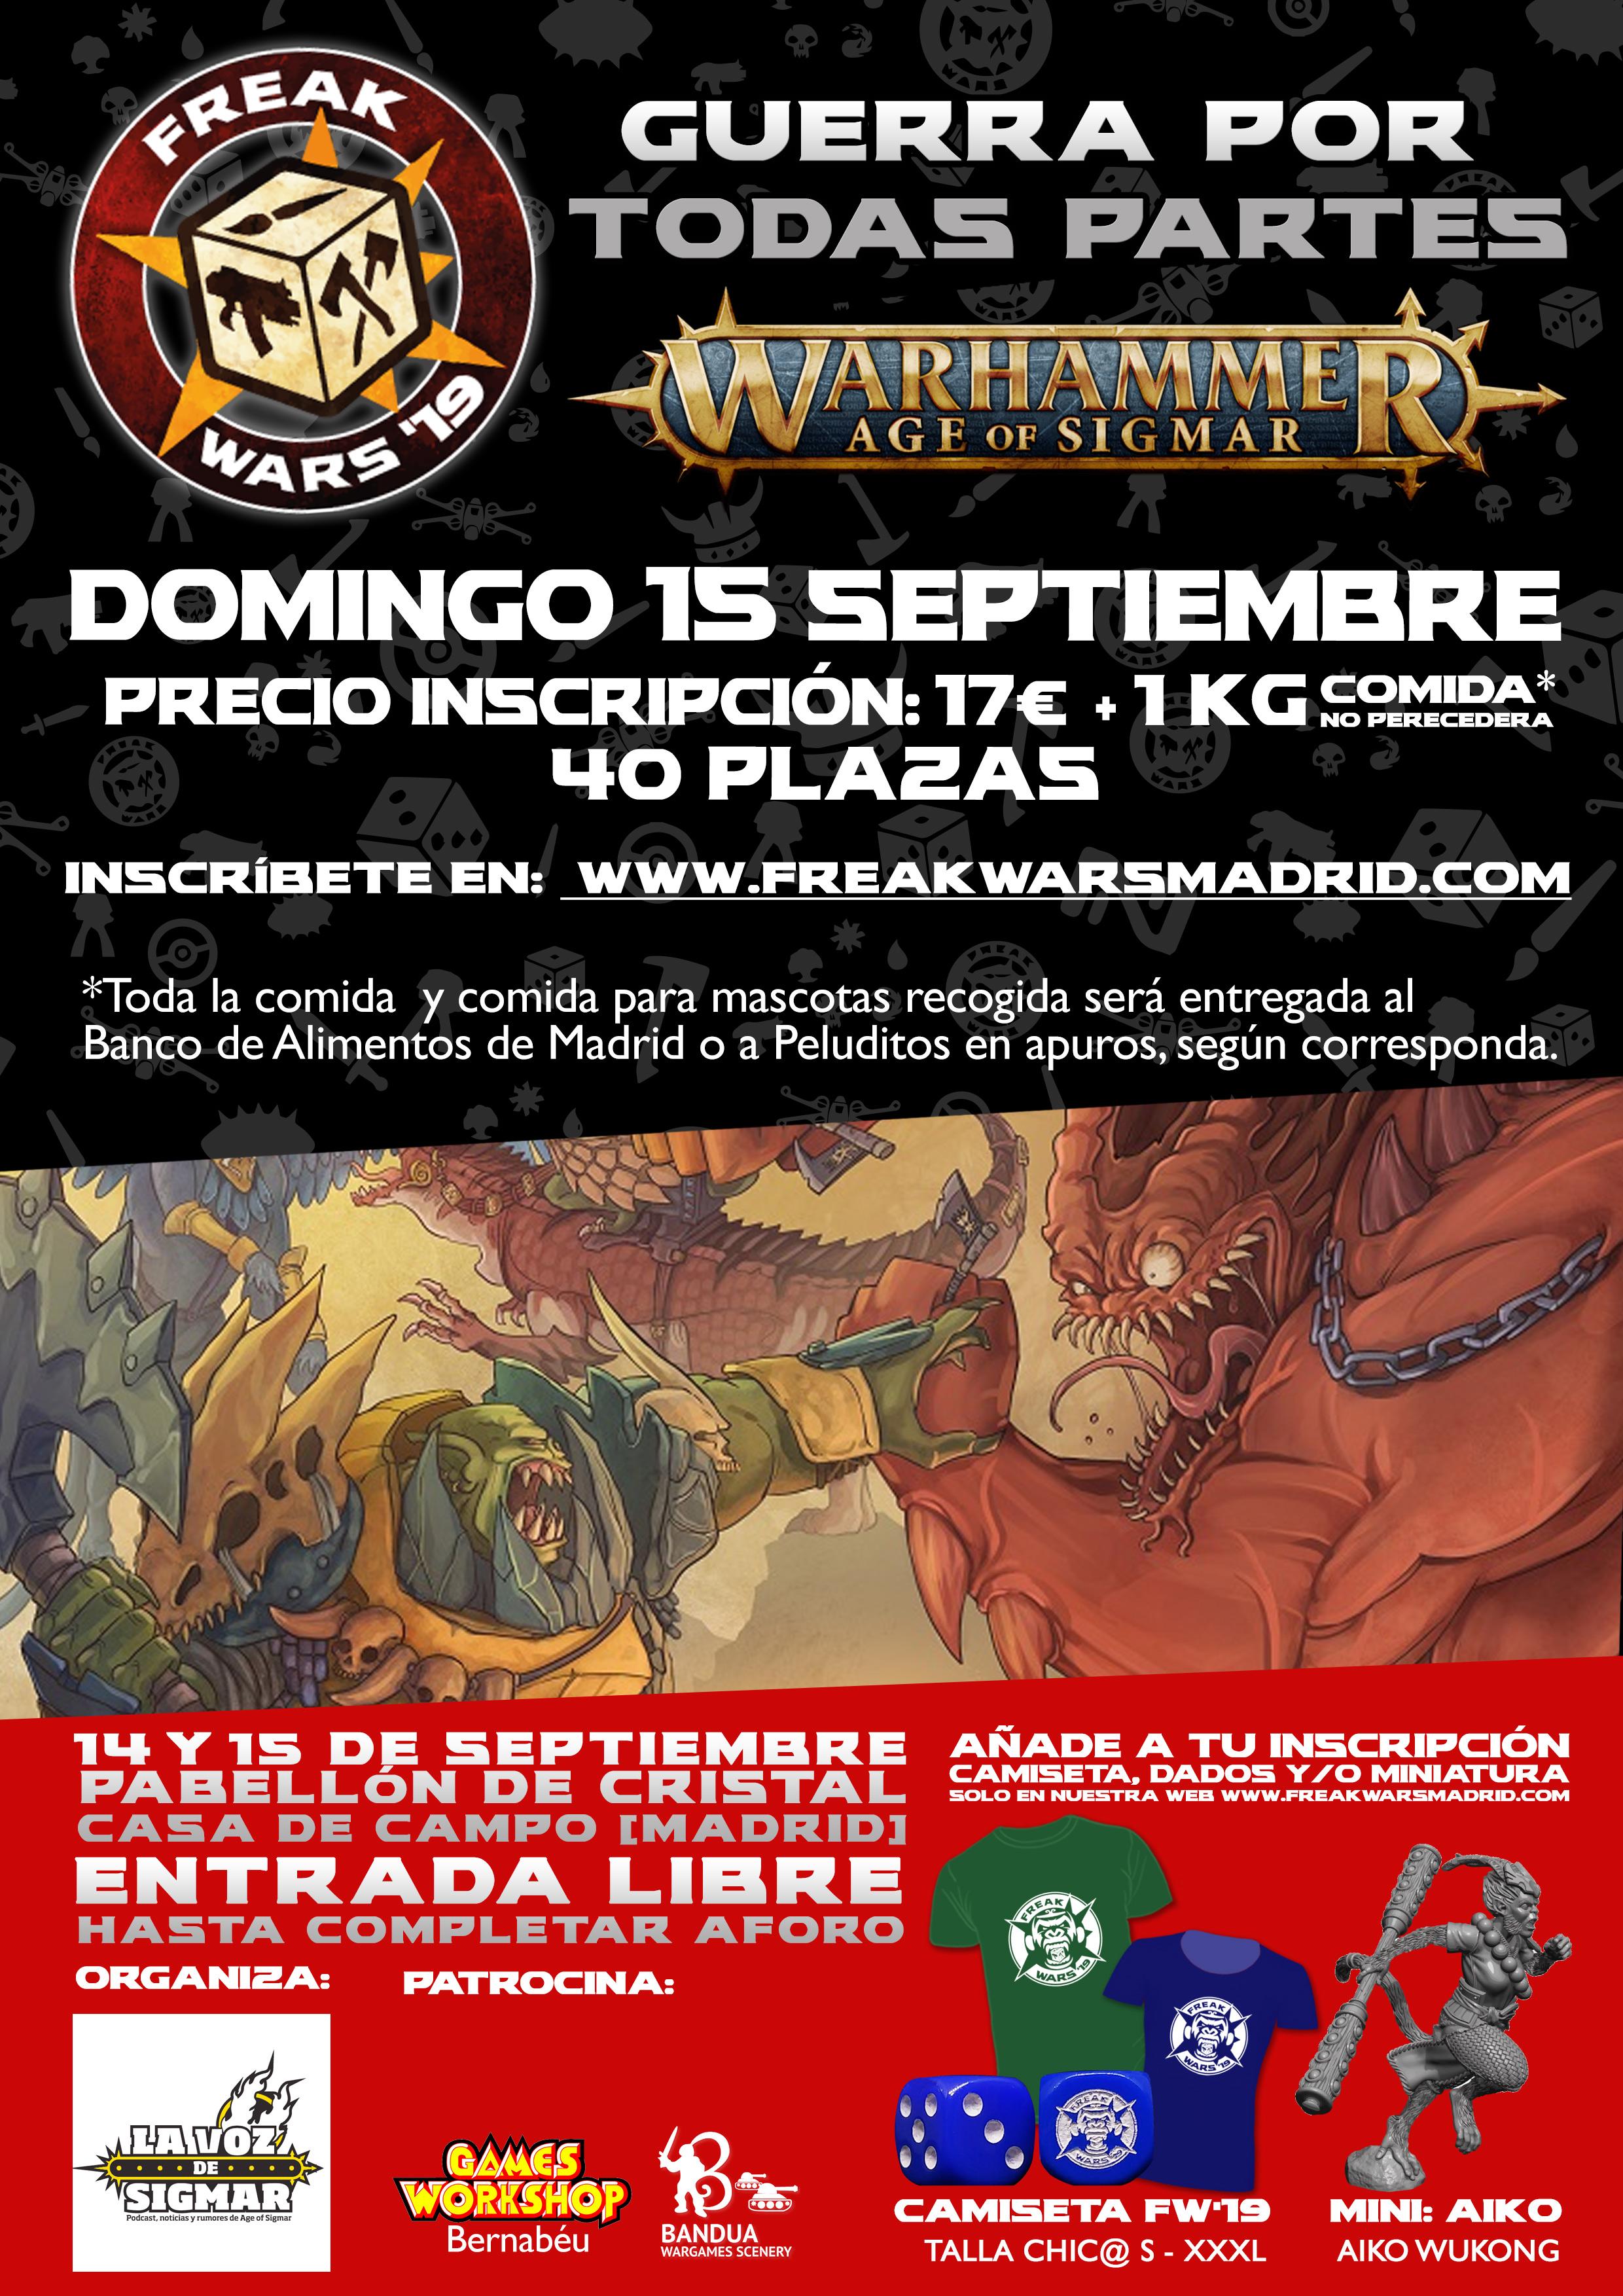 Torneo AoS Guerra en Todas Partes II Freak Wars 19